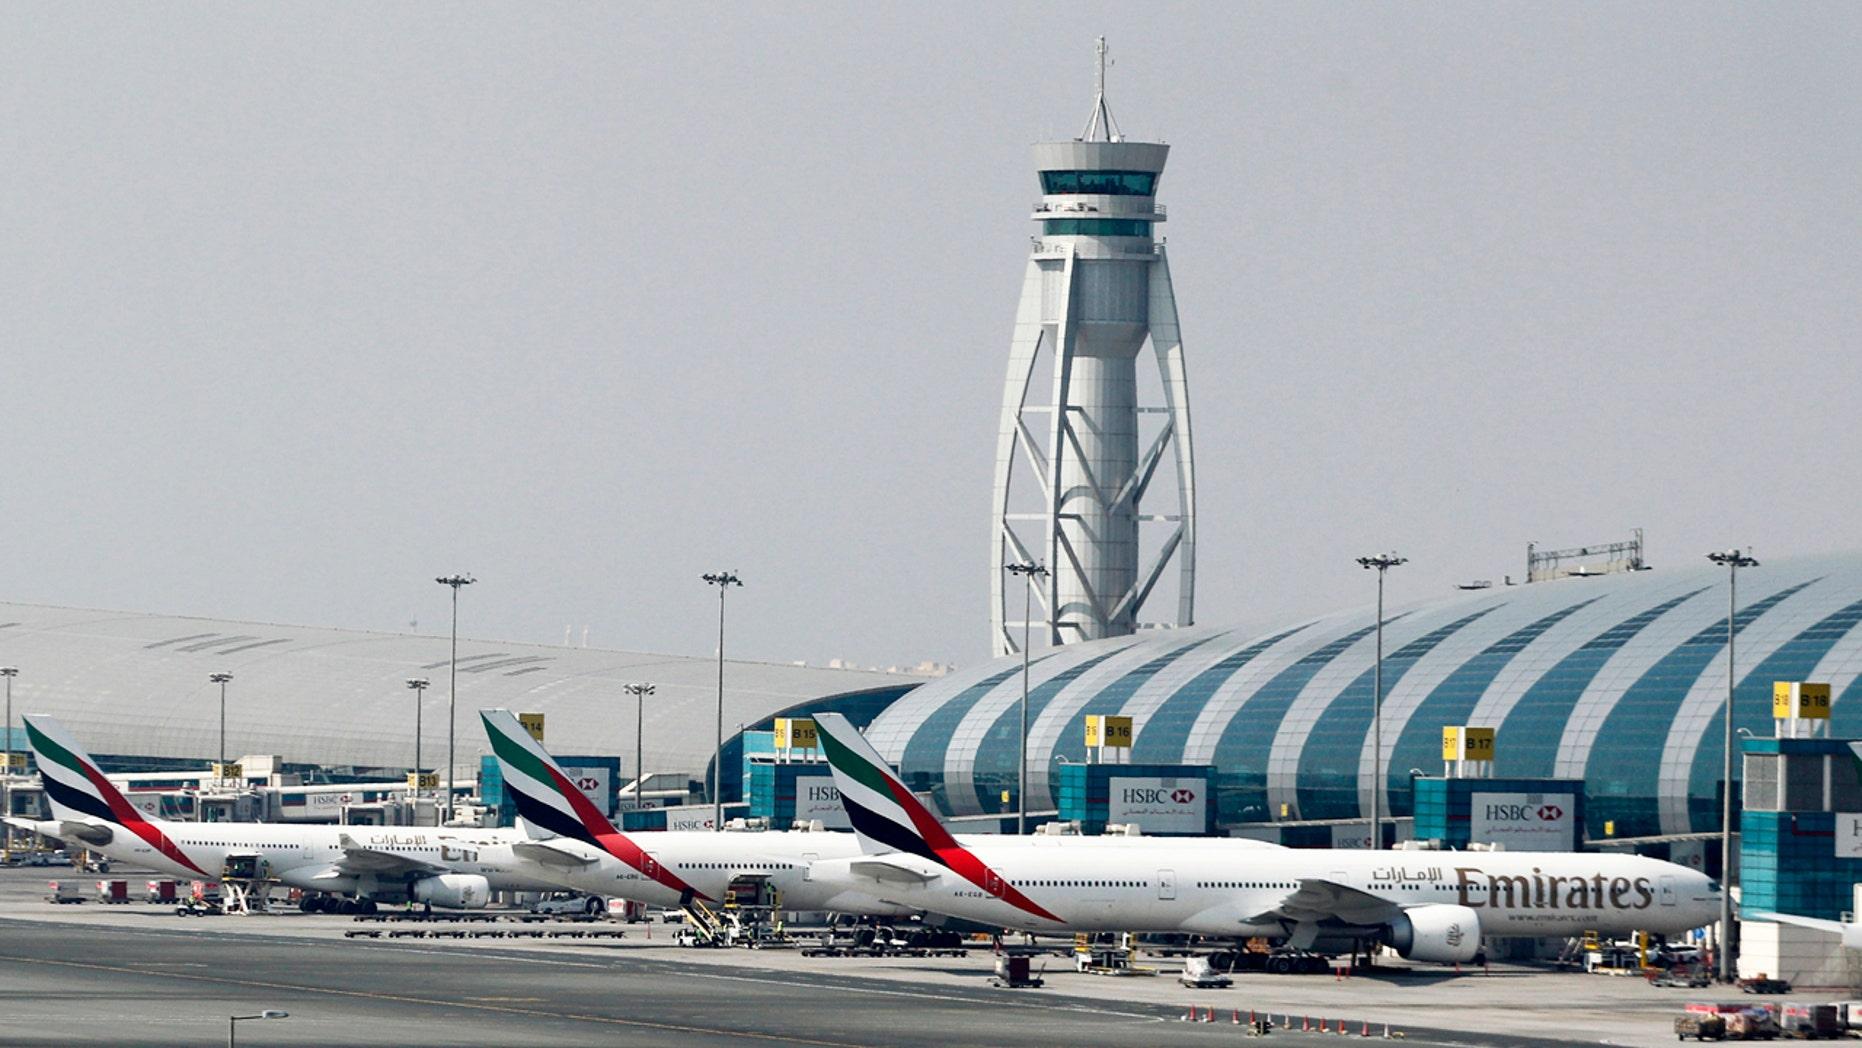 Emirates airplanes at Dubai International Airport.